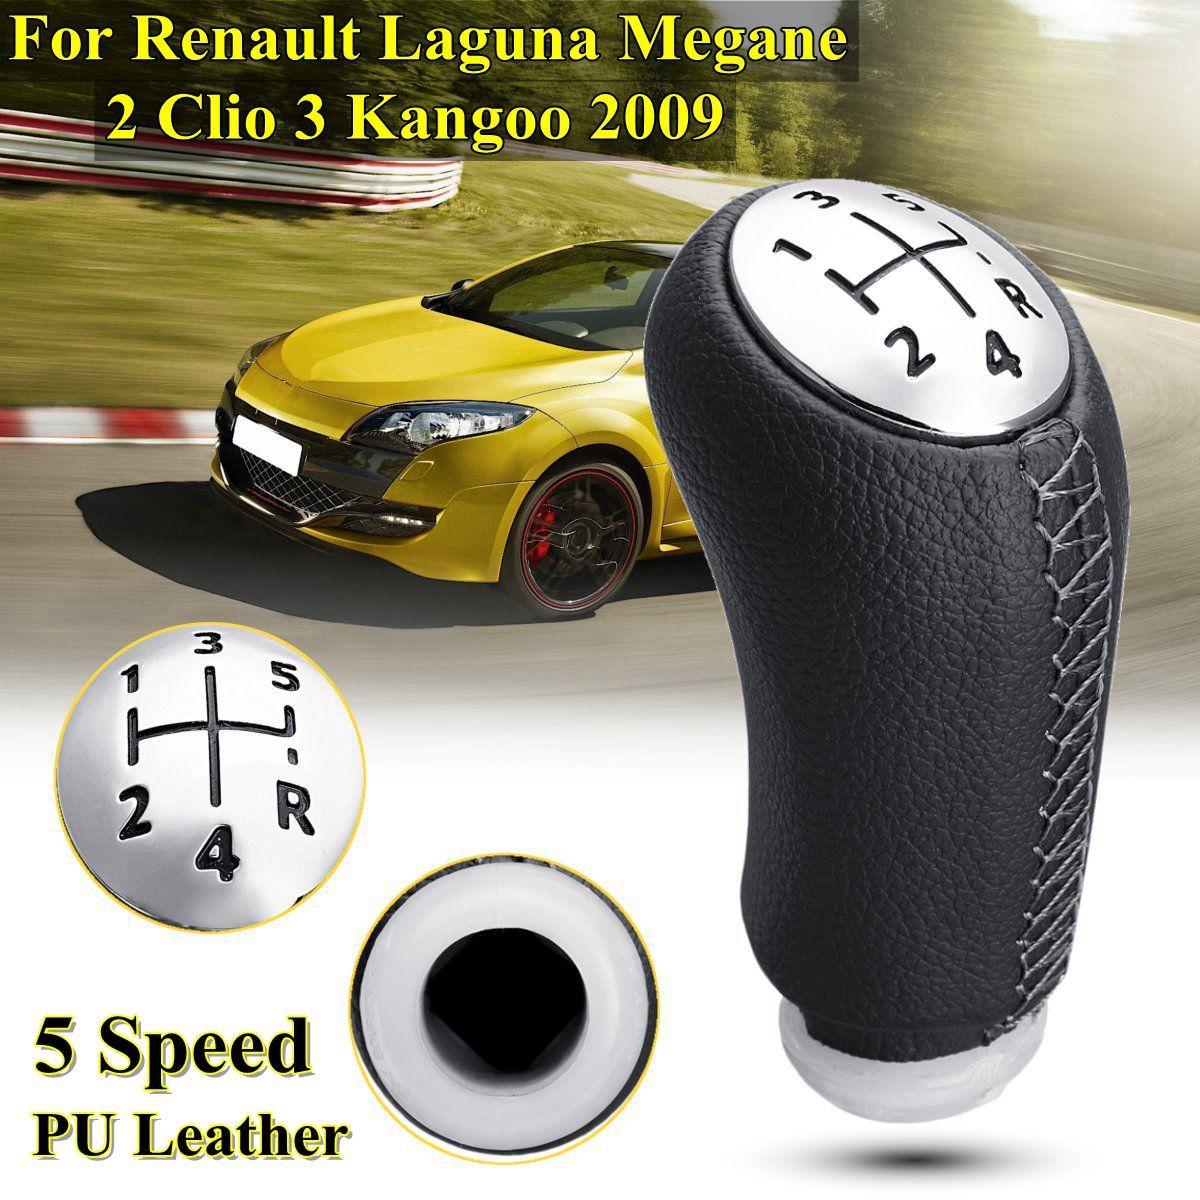 1 pièces cuir brillant mat couleur 5 vitesses levier de vitesse pommeau de levier de vitesse pour RENAULT Laguna Megane 2 Clio 3 2003-2009 Kangoo 2009